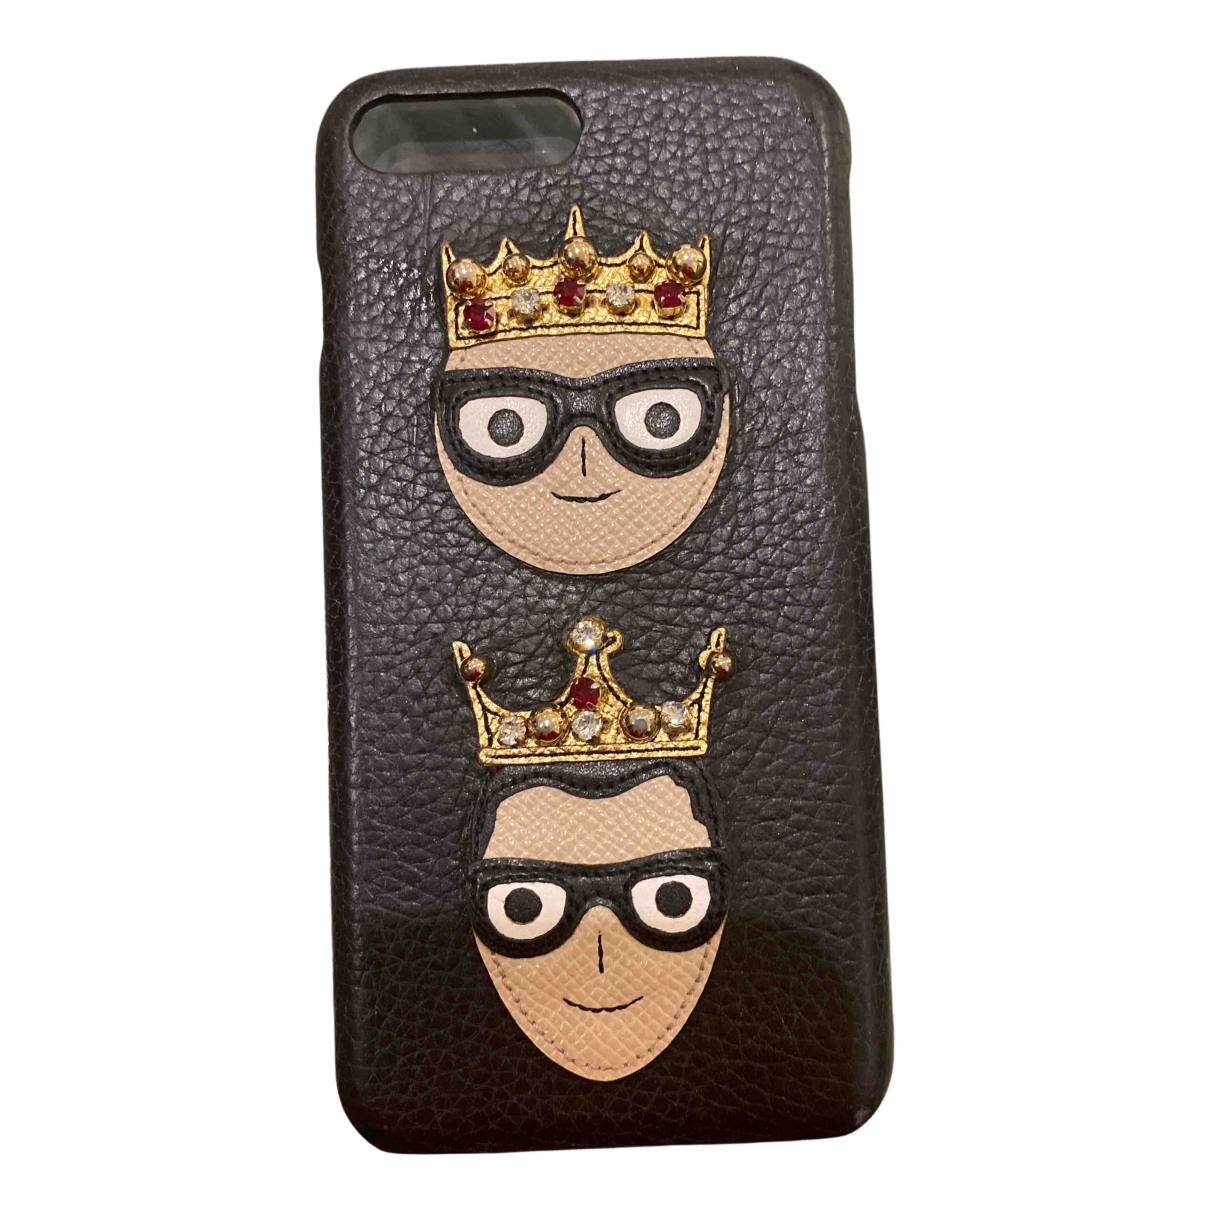 Funda iphone de Cuero Dolce & Gabbana